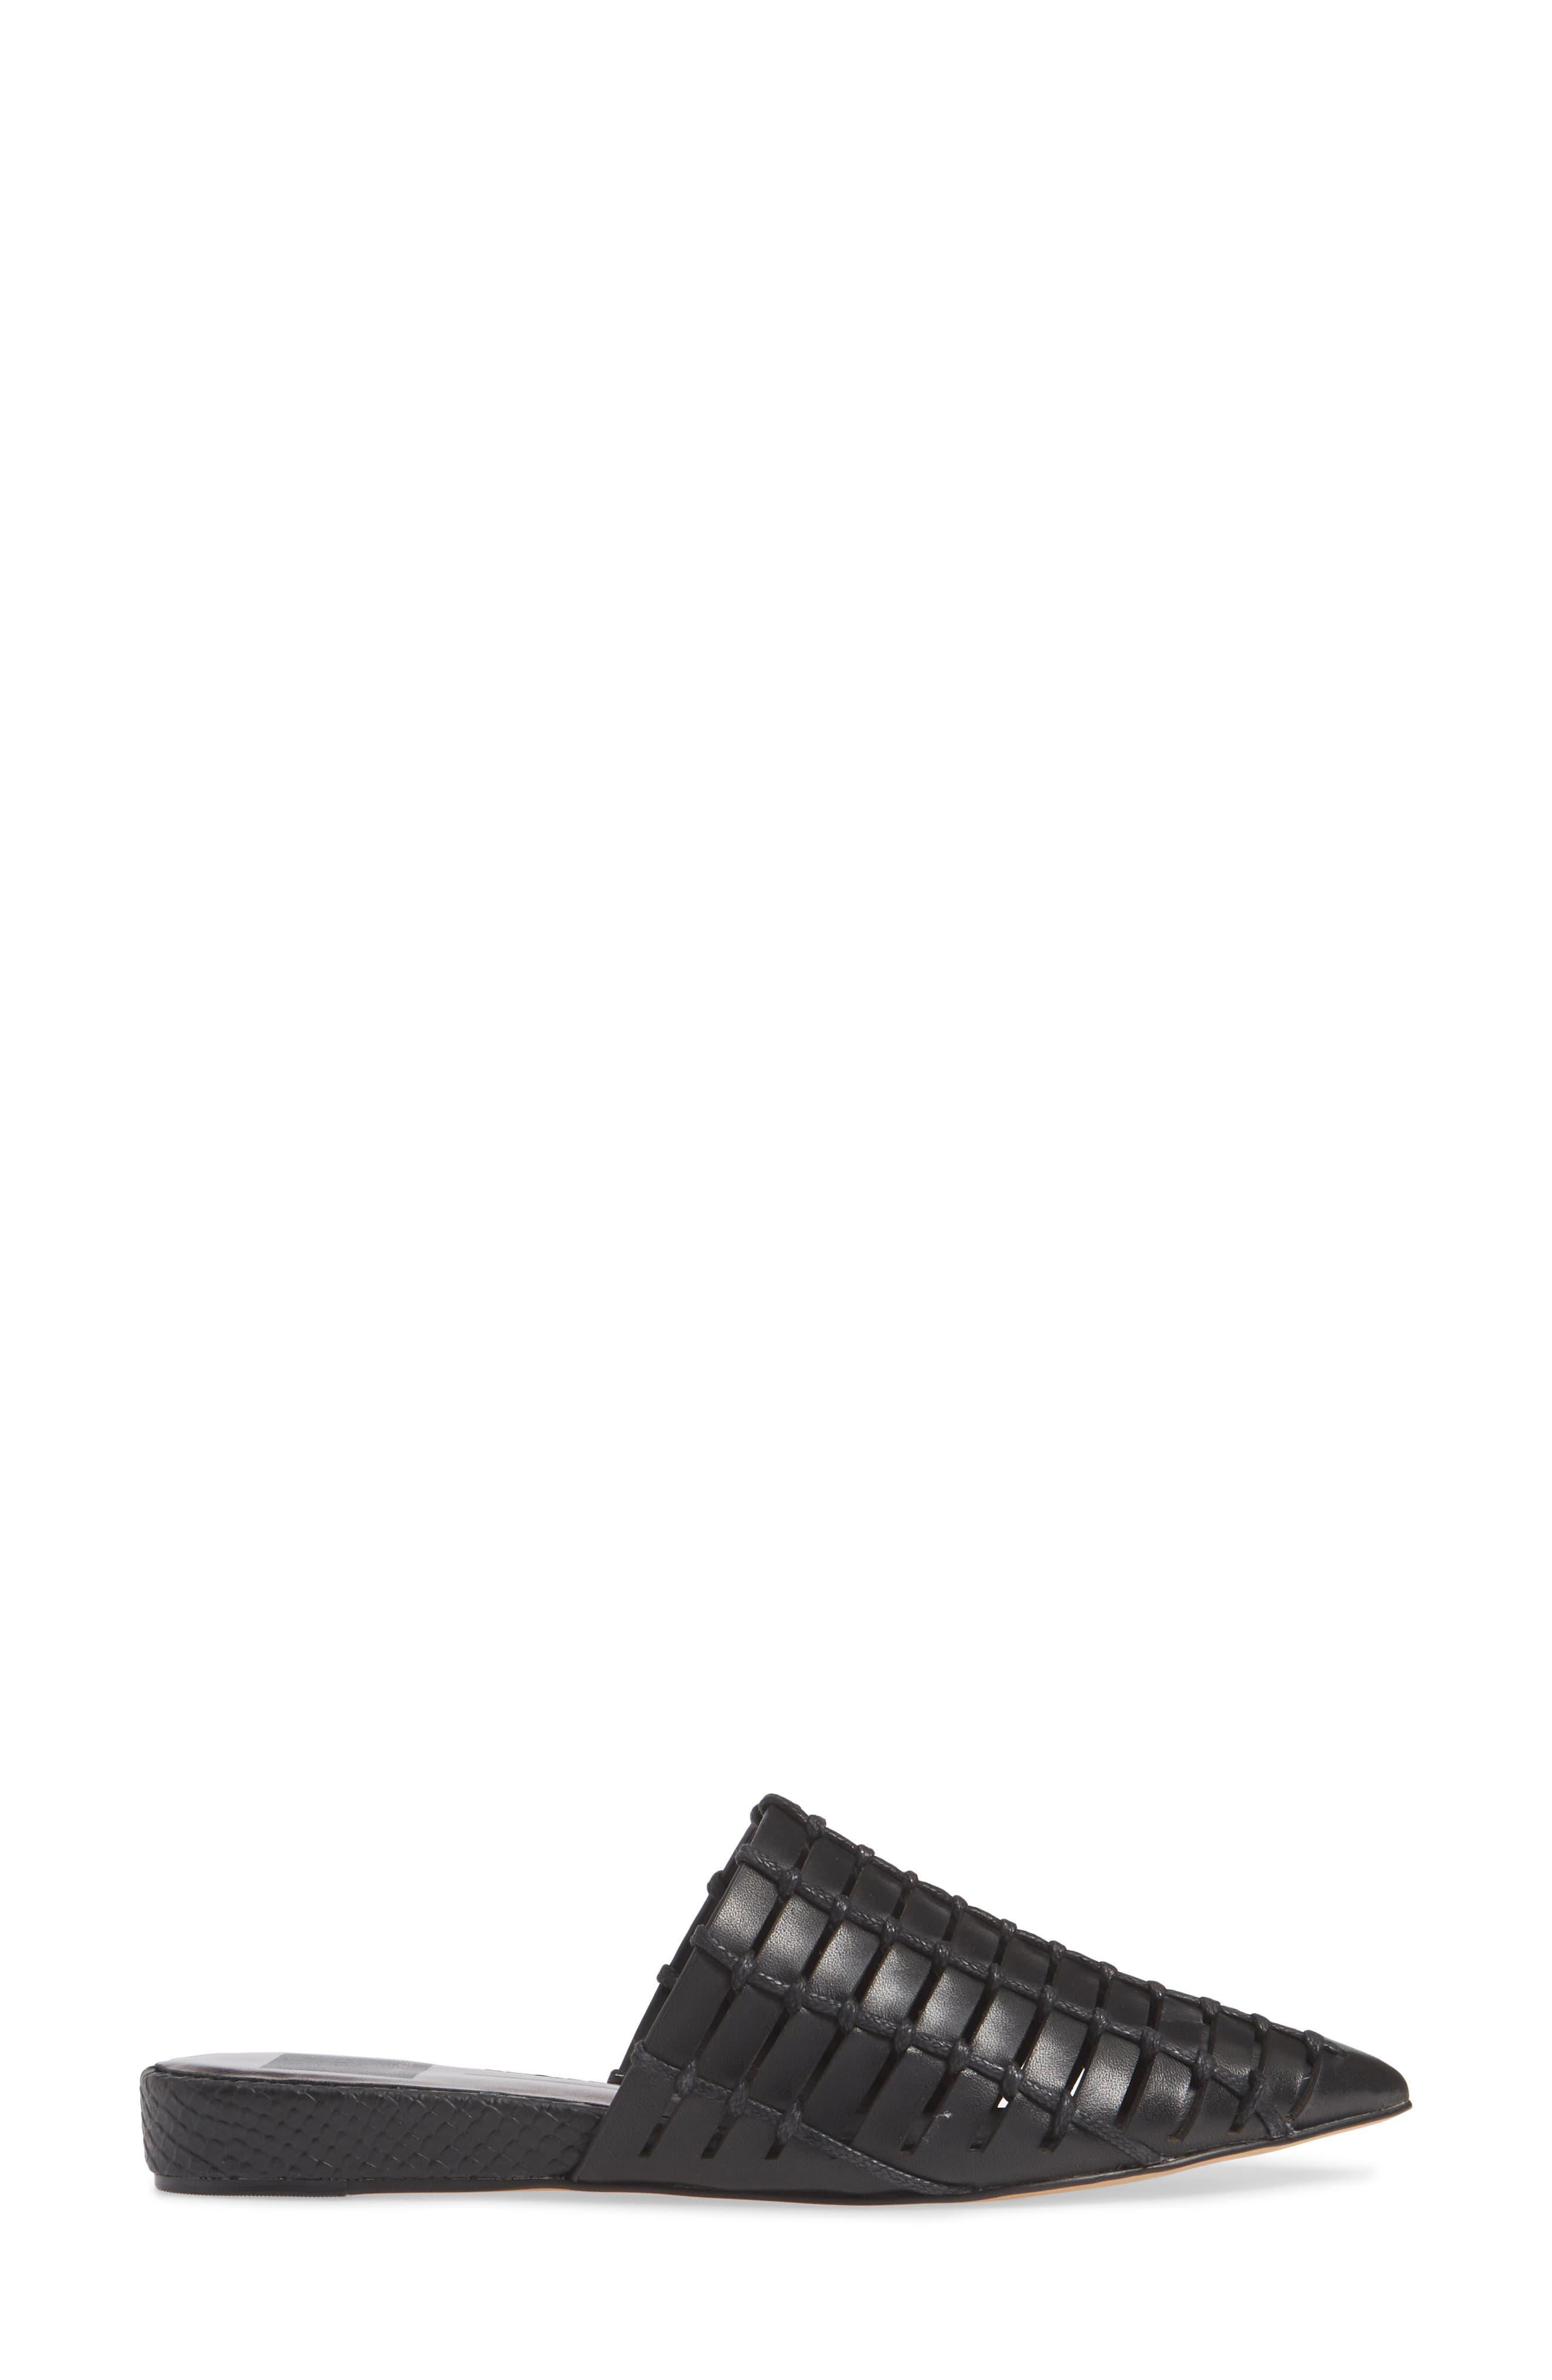 DOLCE VITA, Elina Woven Mule, Alternate thumbnail 3, color, BLACK LEATHER